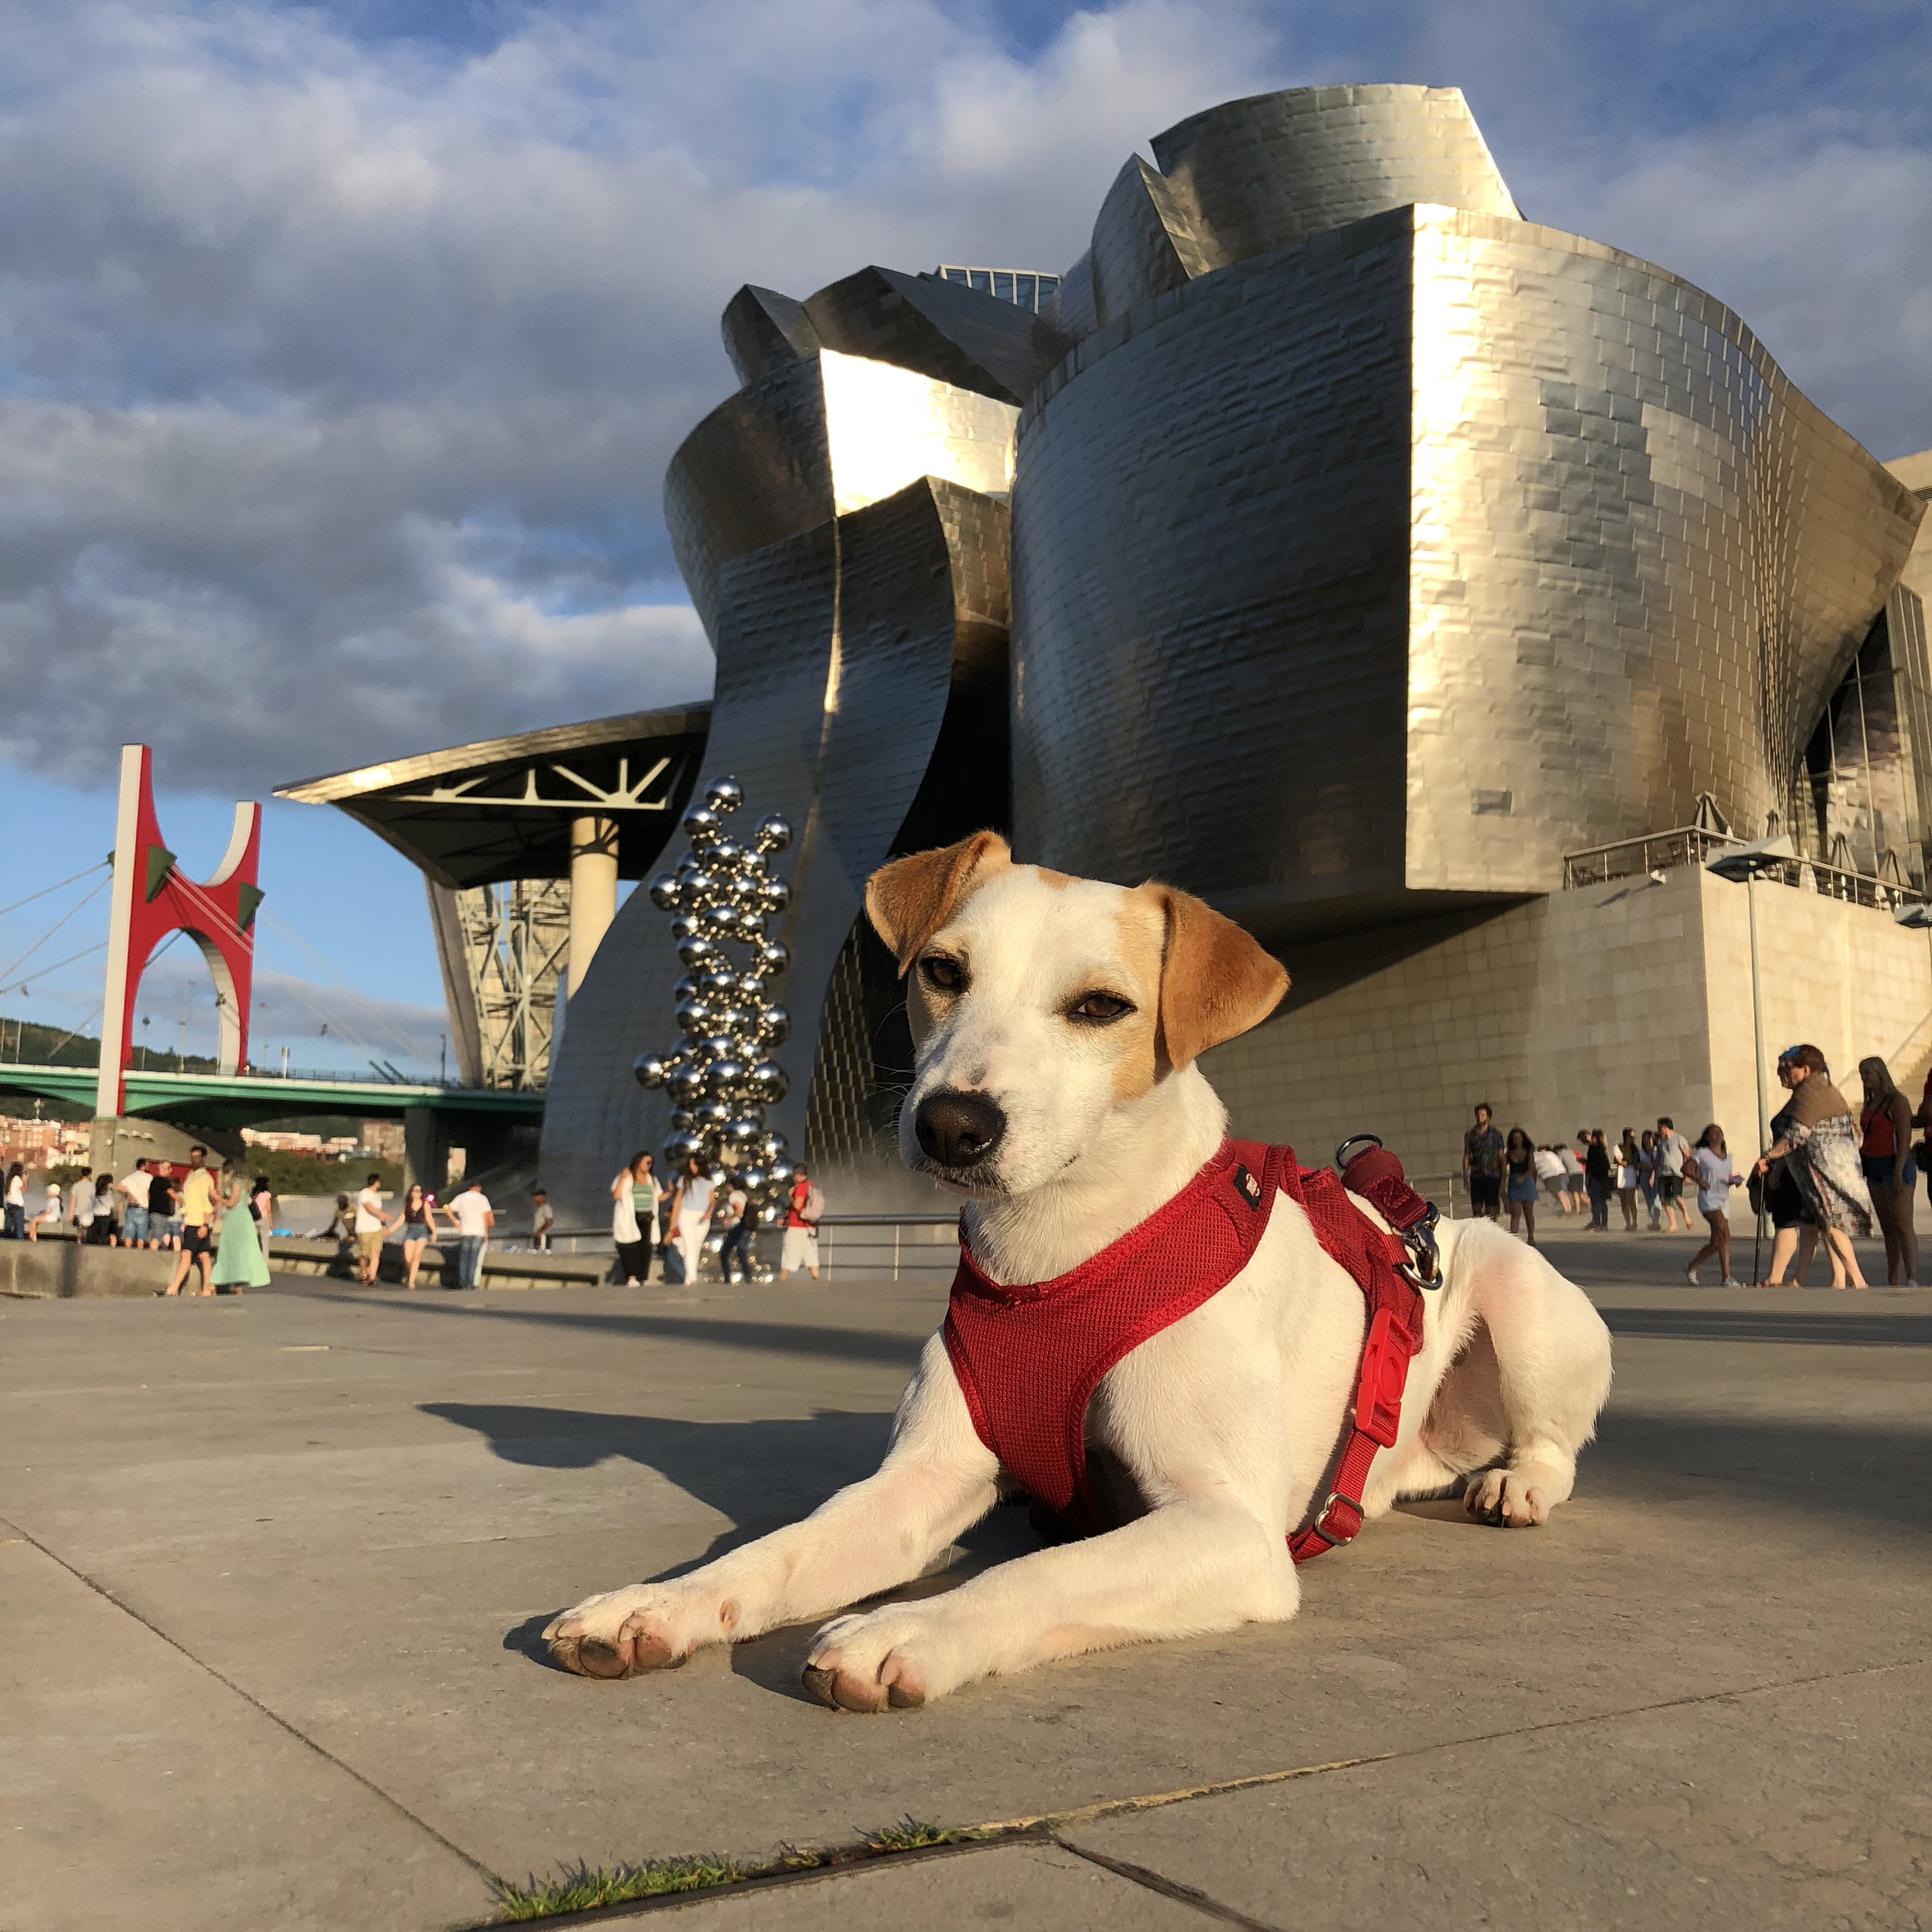 At the Guggenheim Museum.